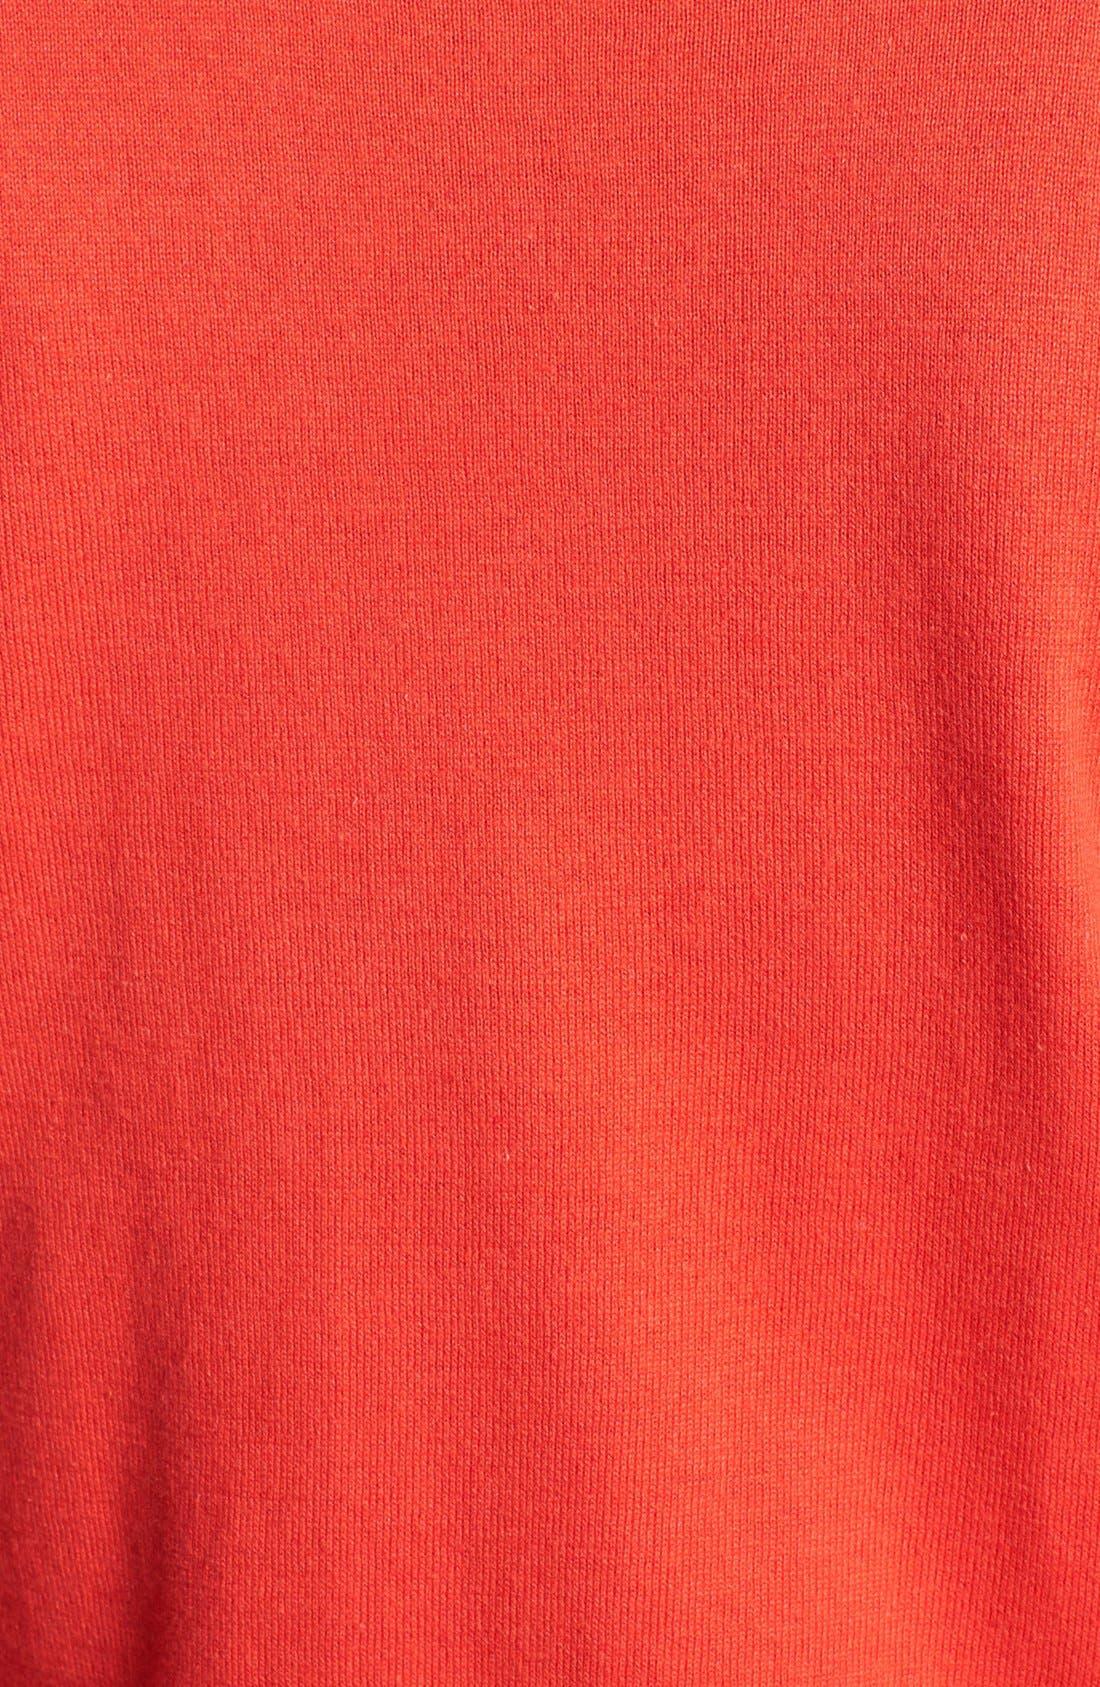 Alternate Image 3  - kate spade new york 'yardley' layered sweater